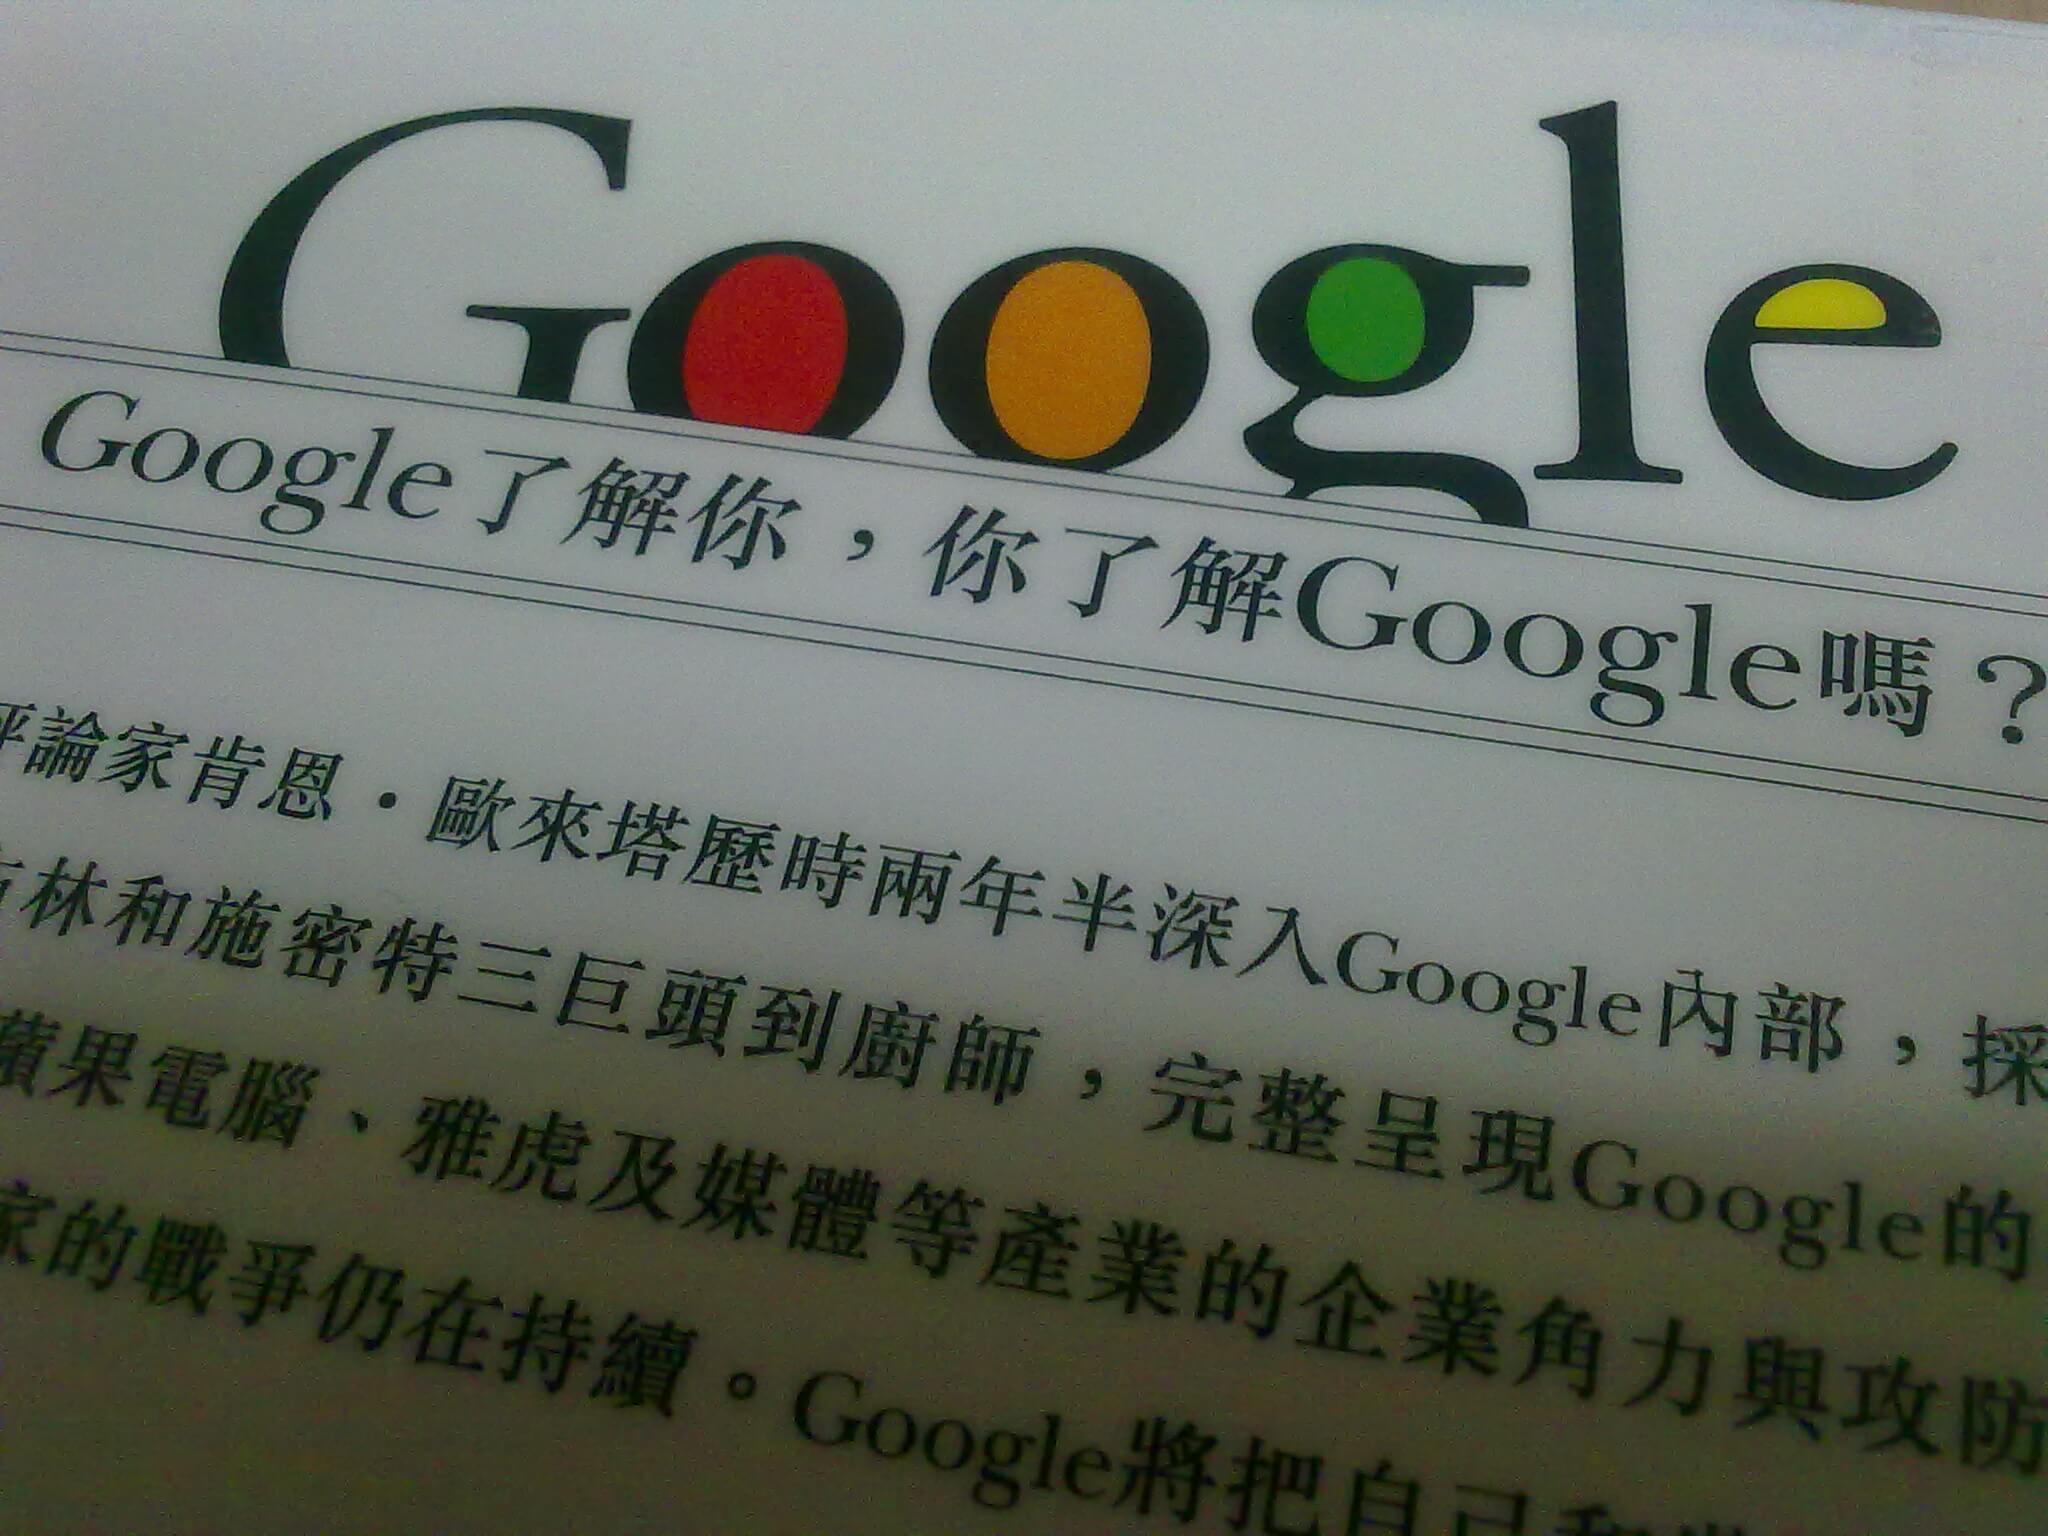 [圖書分享]Google大未來 Review of Ken Auletta's Googled